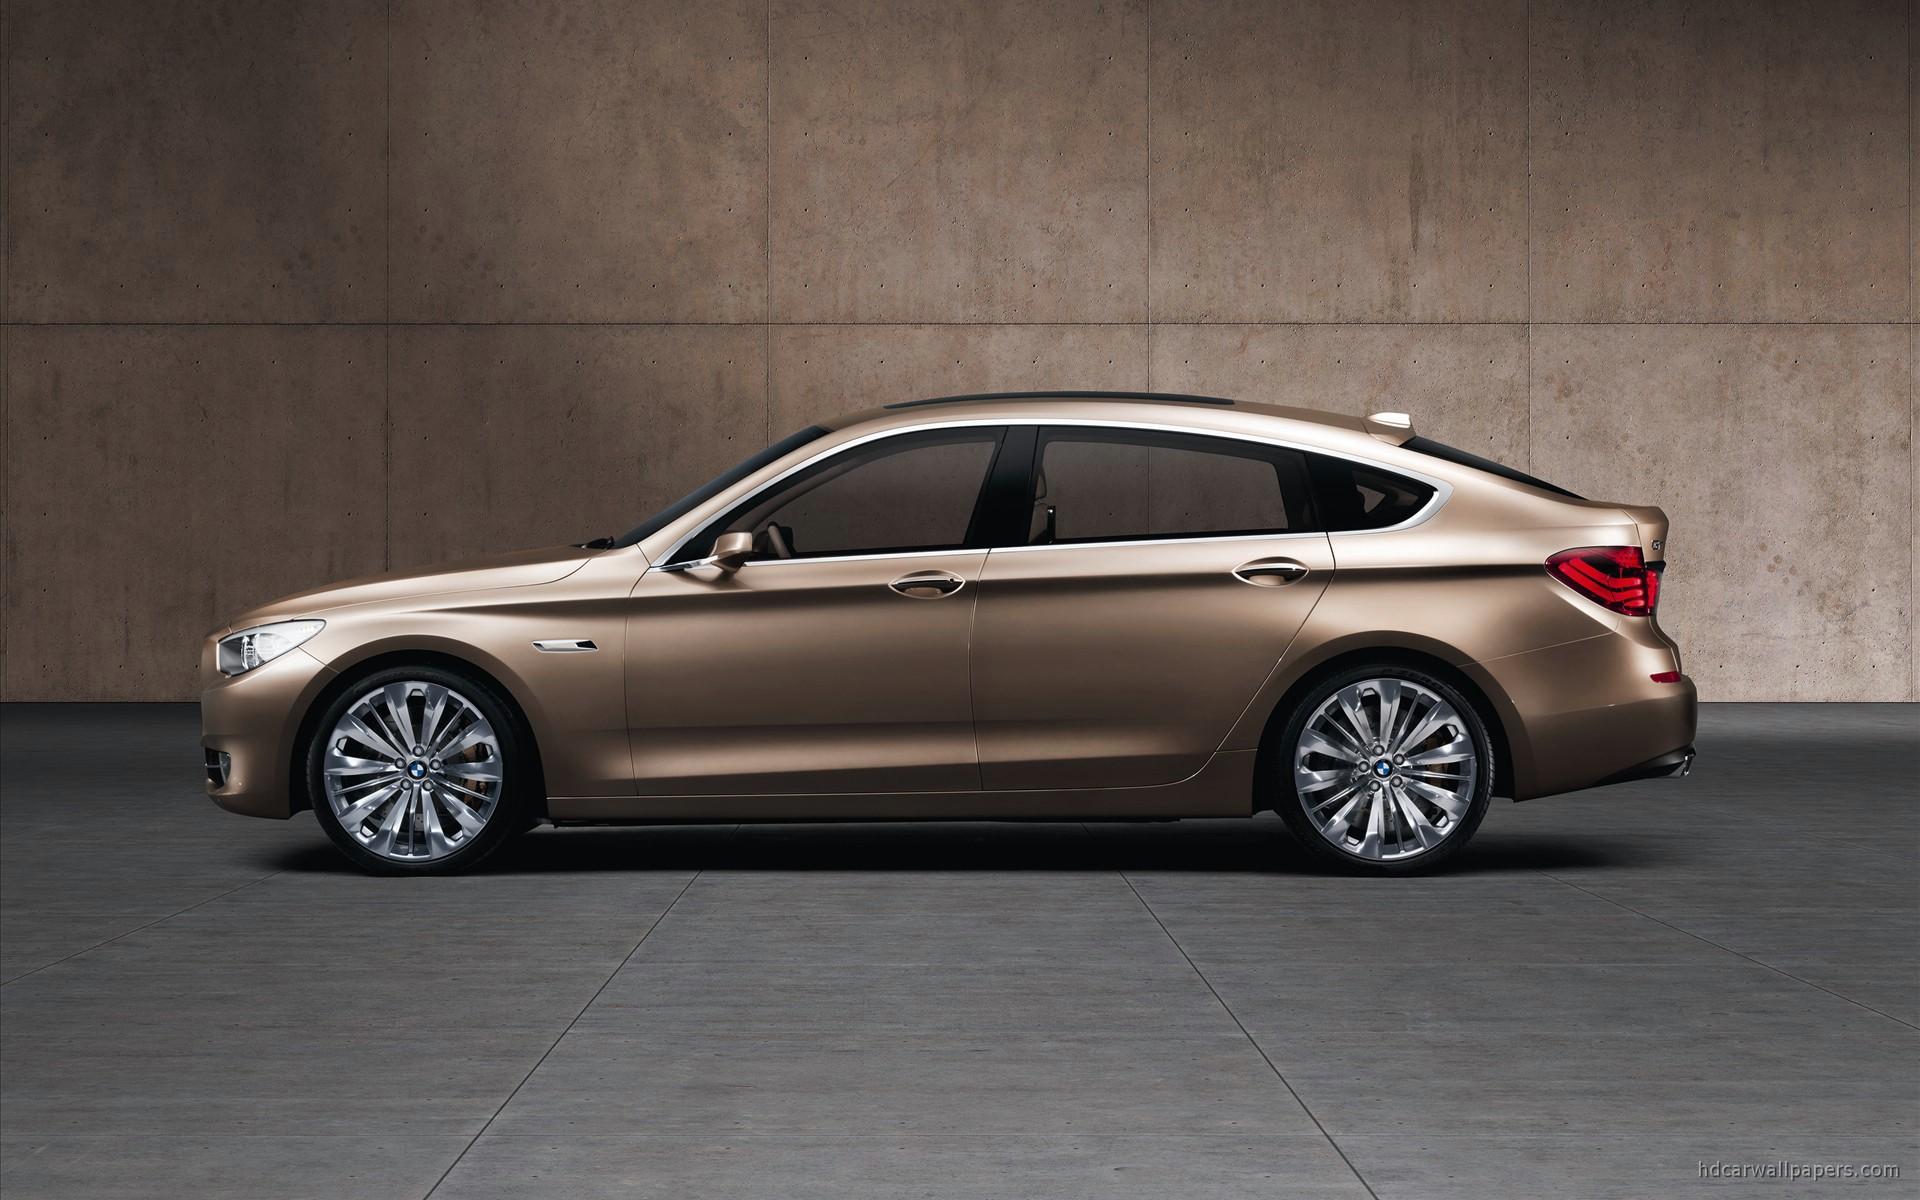 2009 BMW Concept 5 Series Gran Turismo 2 Wallpaper | HD Car ...